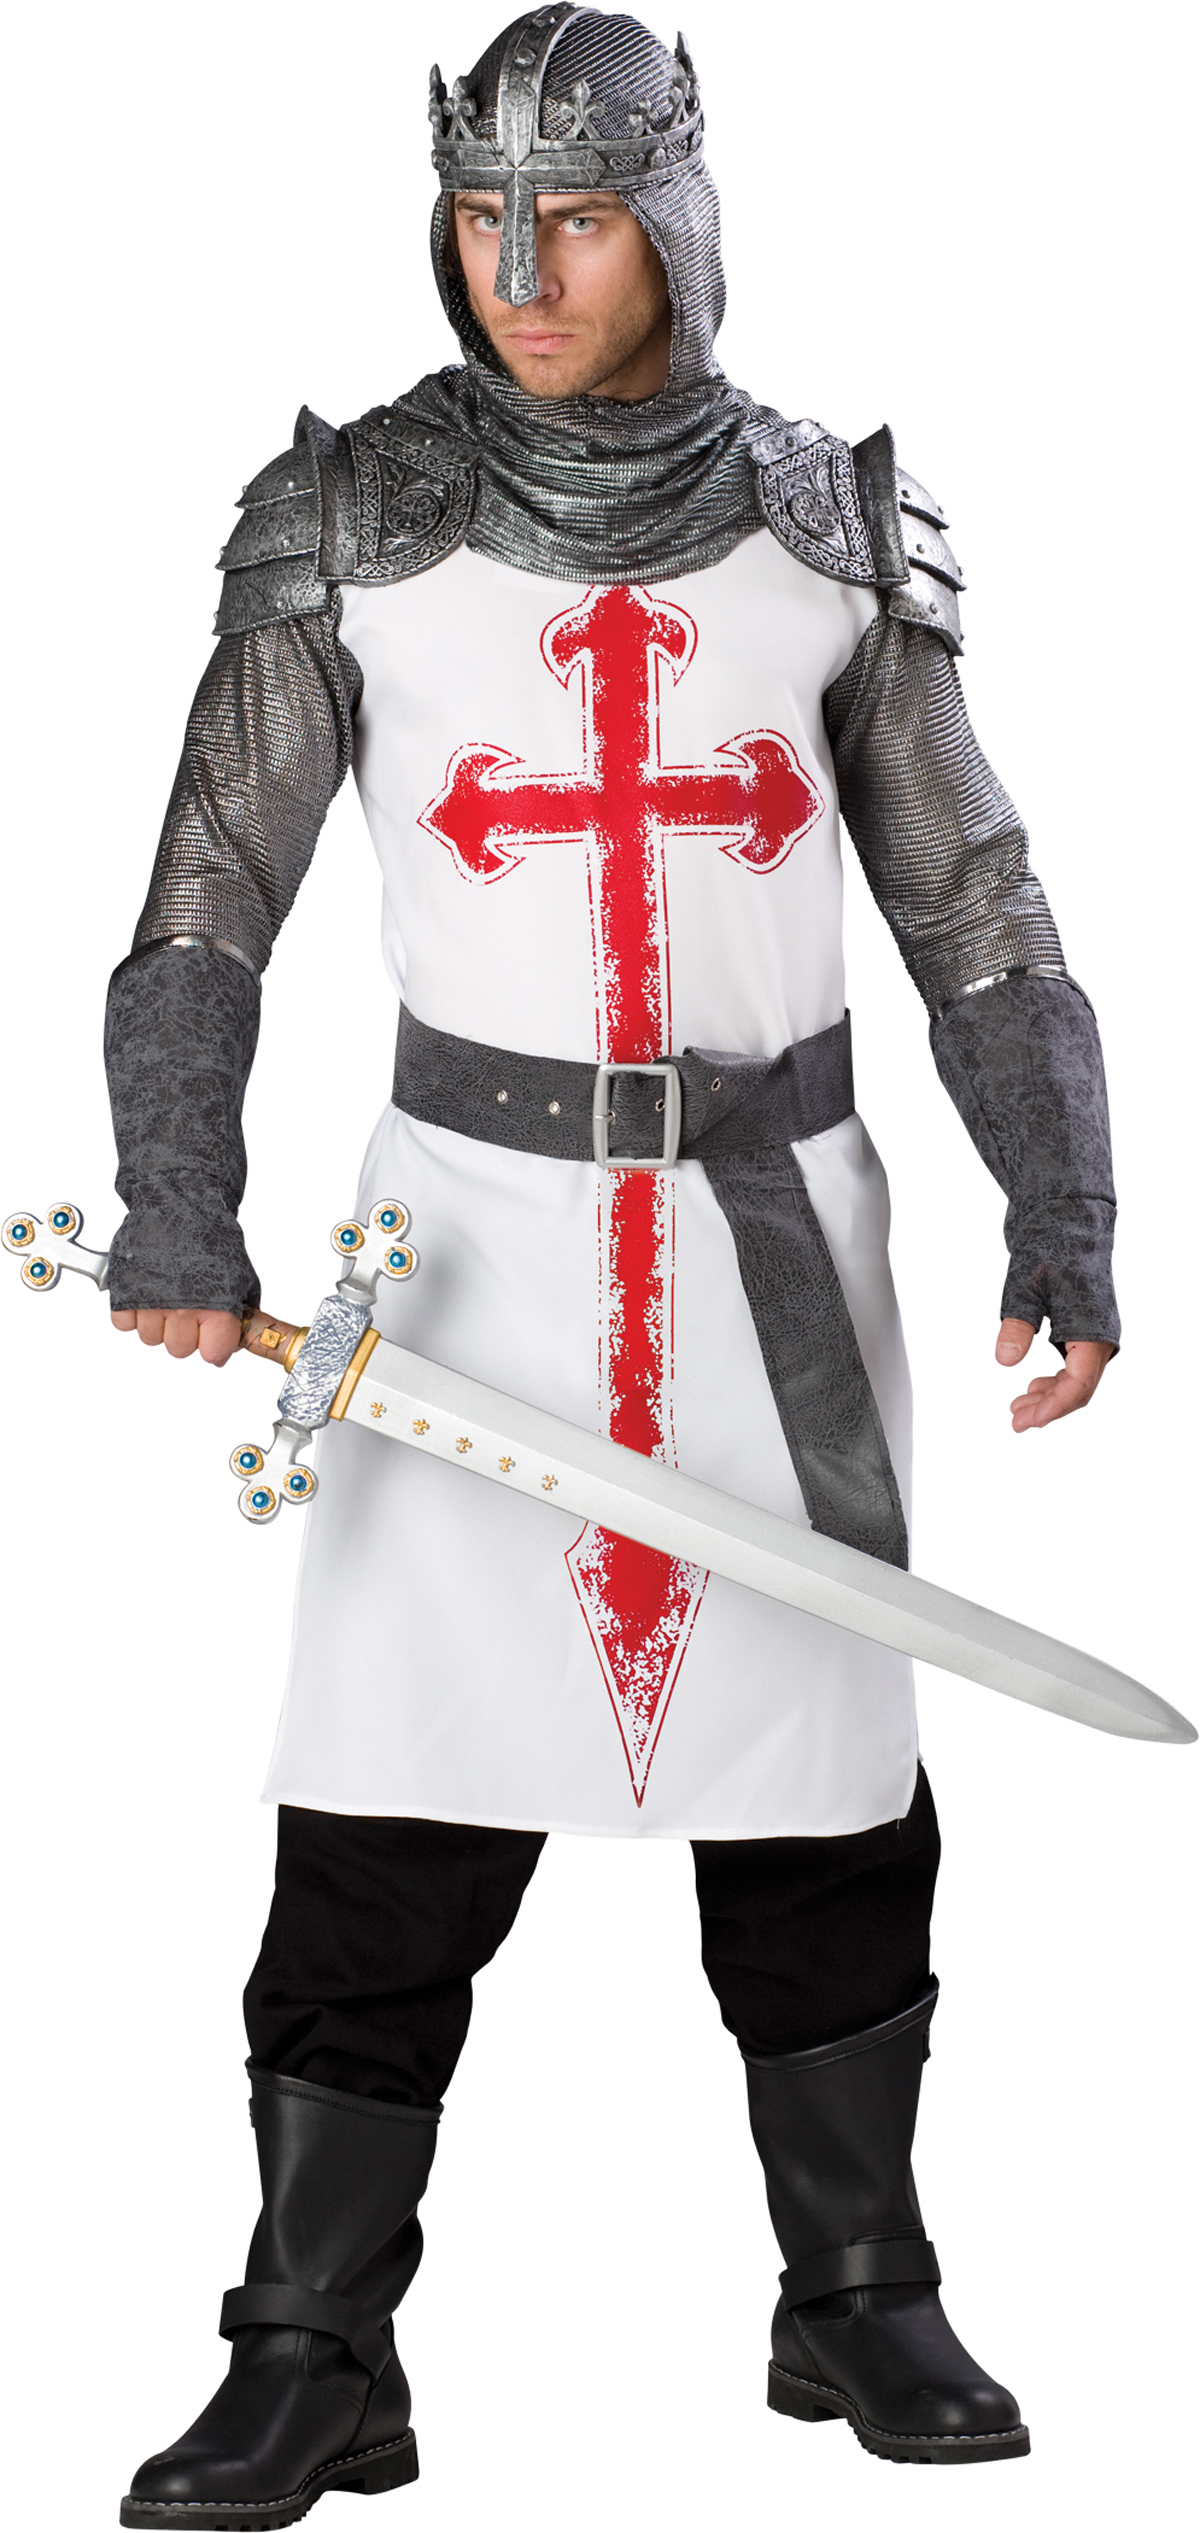 http://images.buycostumes.com/mgen/merchandiser/crusader-premier-adult-costume-bc-800120.jpg